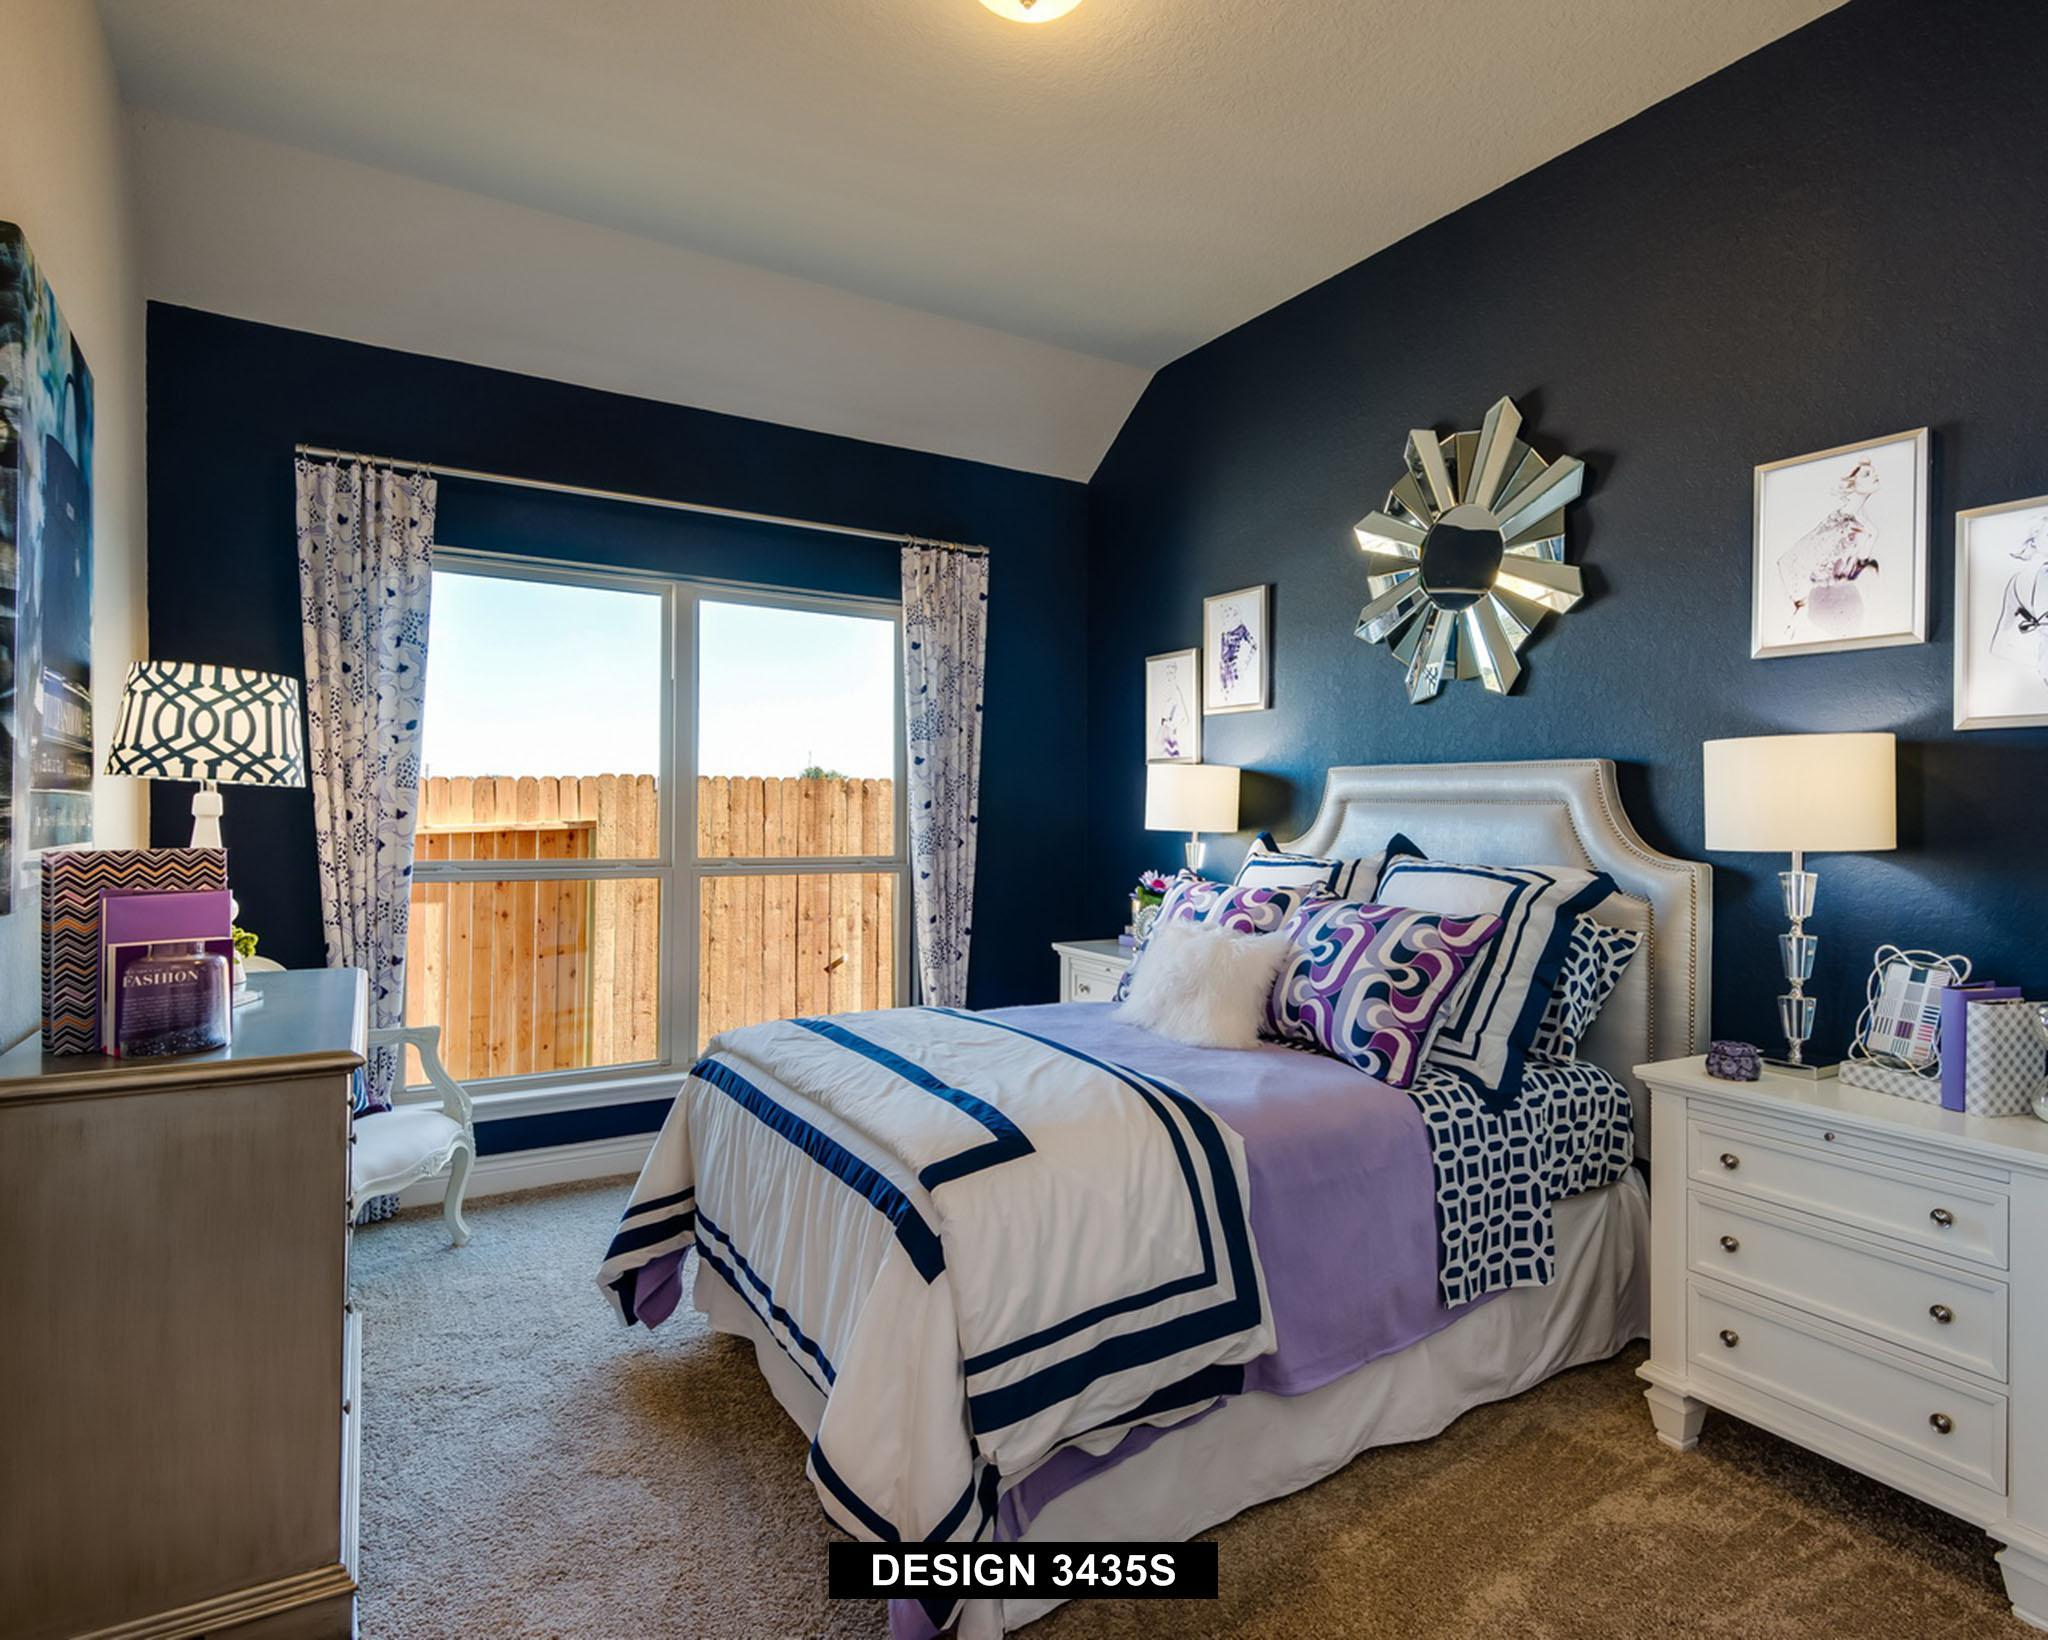 Bedroom-in-3435S-at-River Valley 70'-in-Fair Oaks Ranch